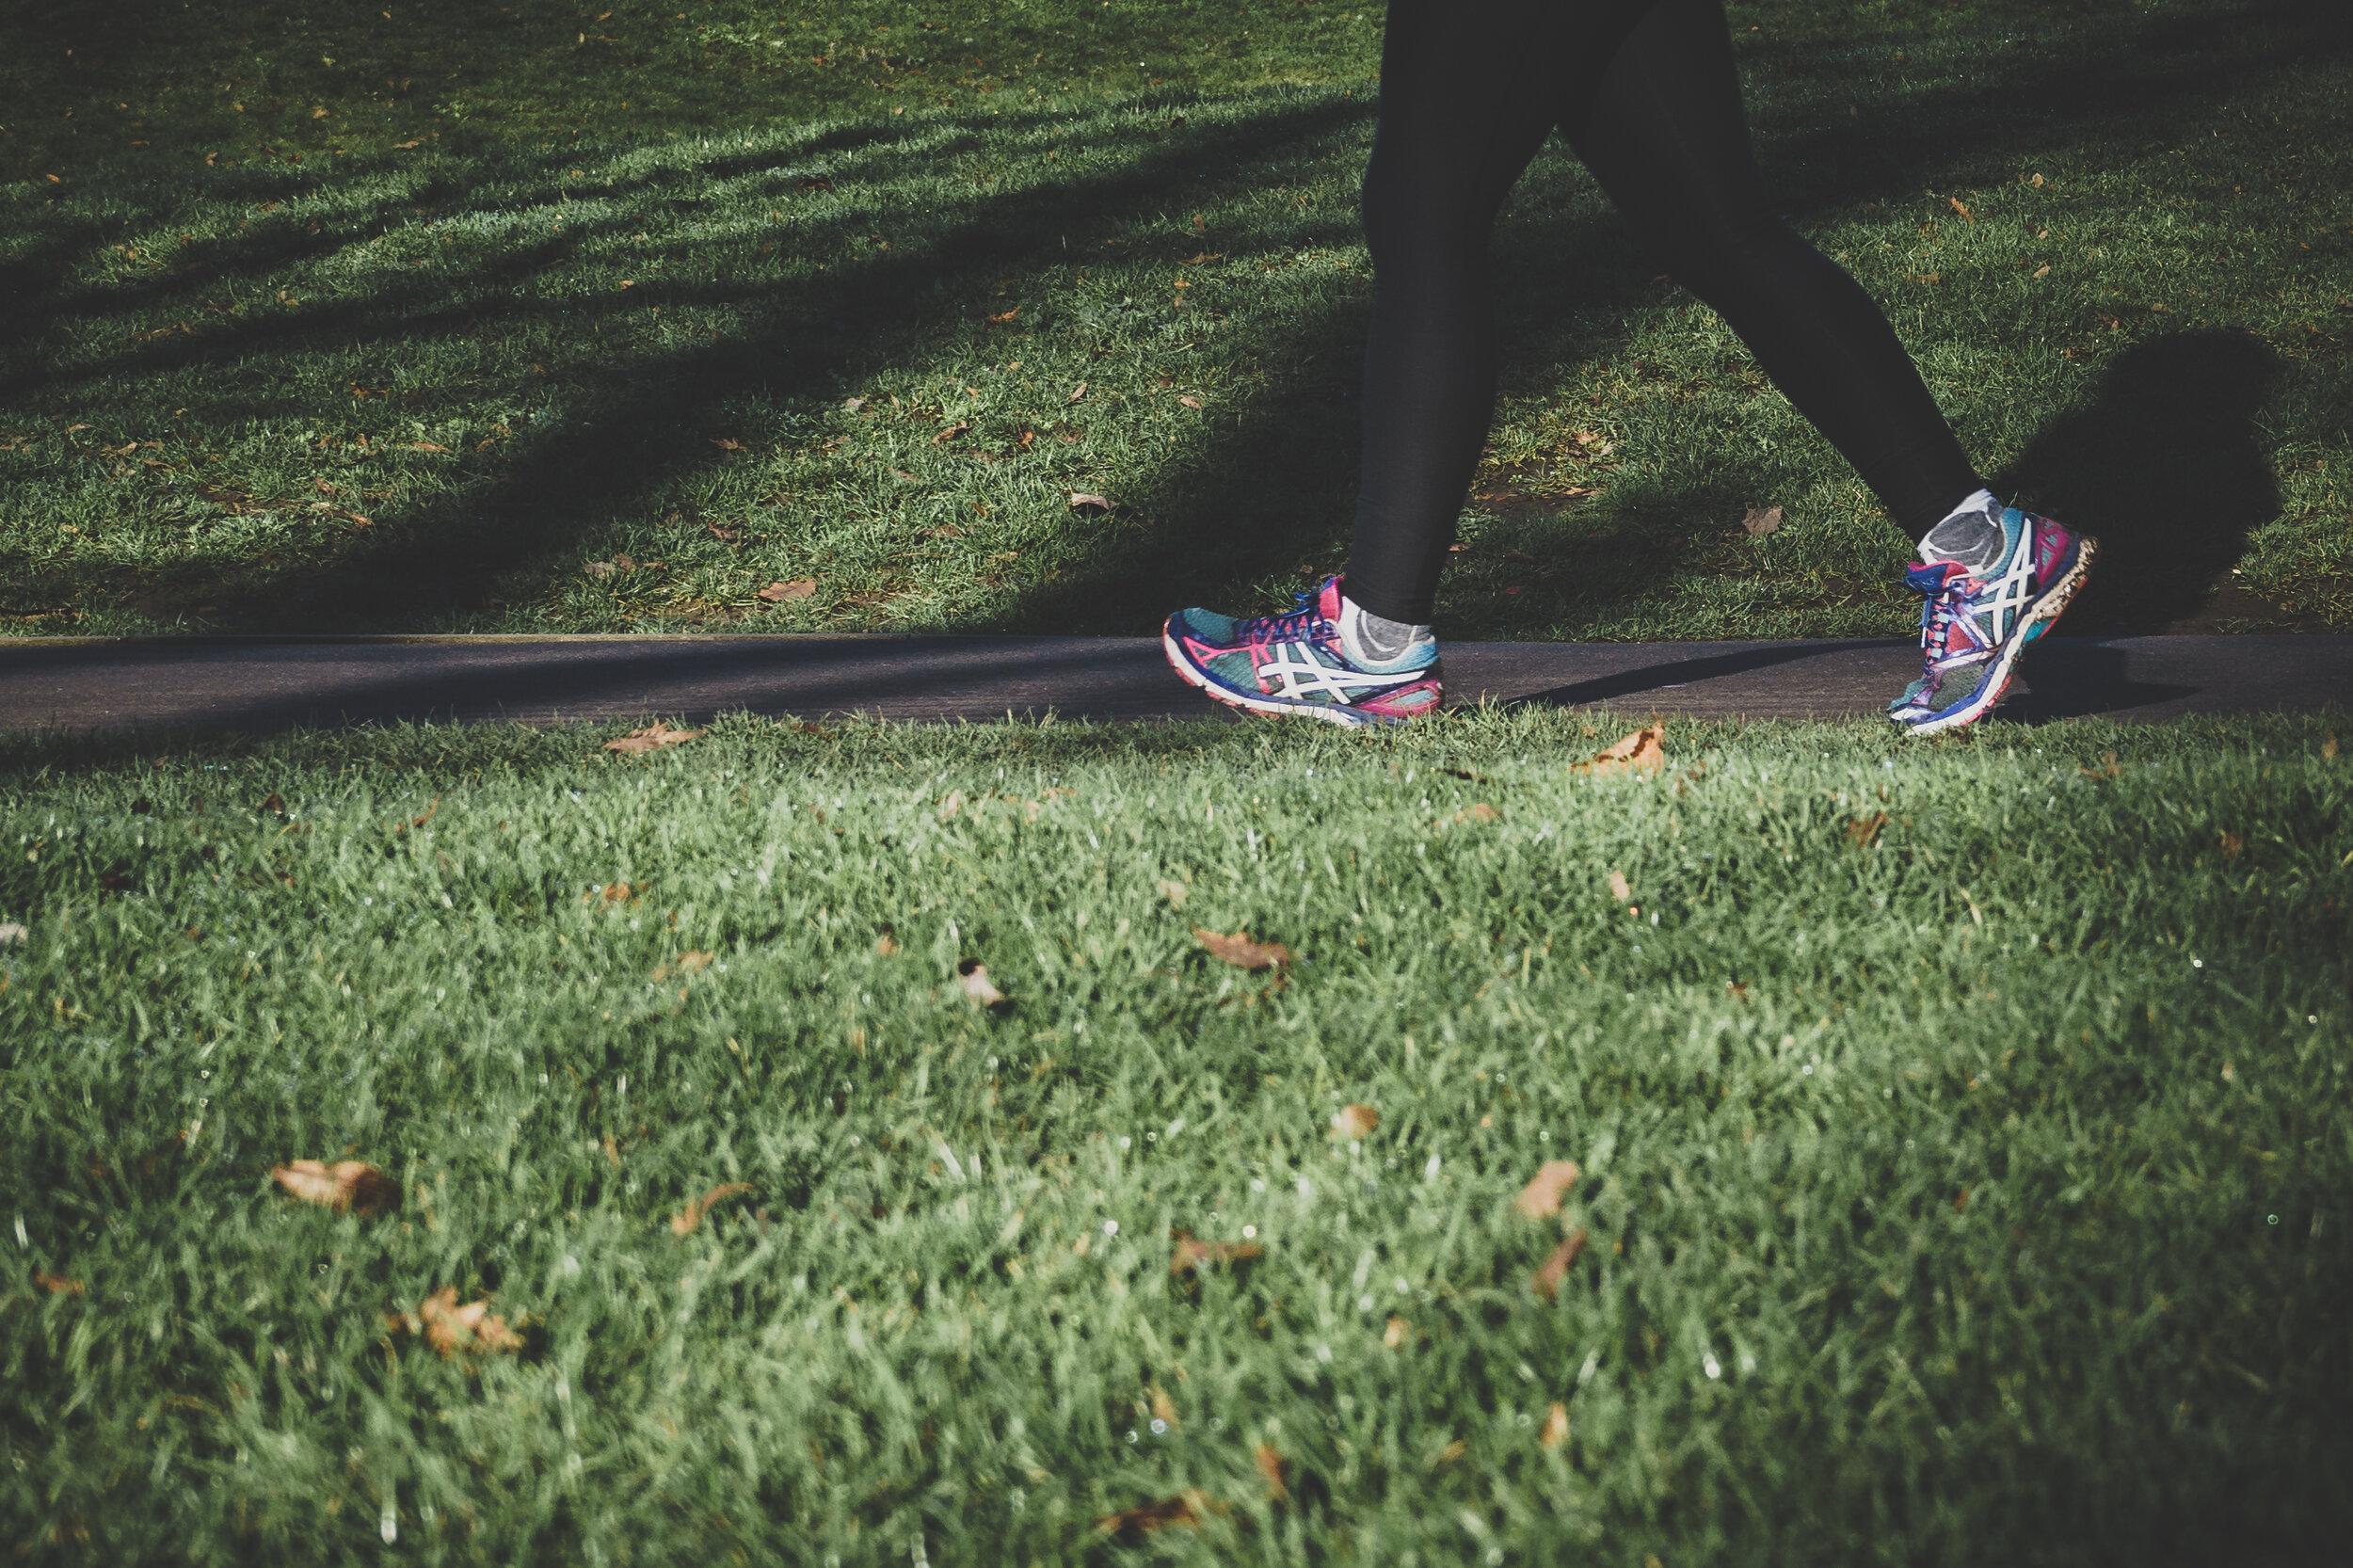 walk-and-talk-therapy-nj